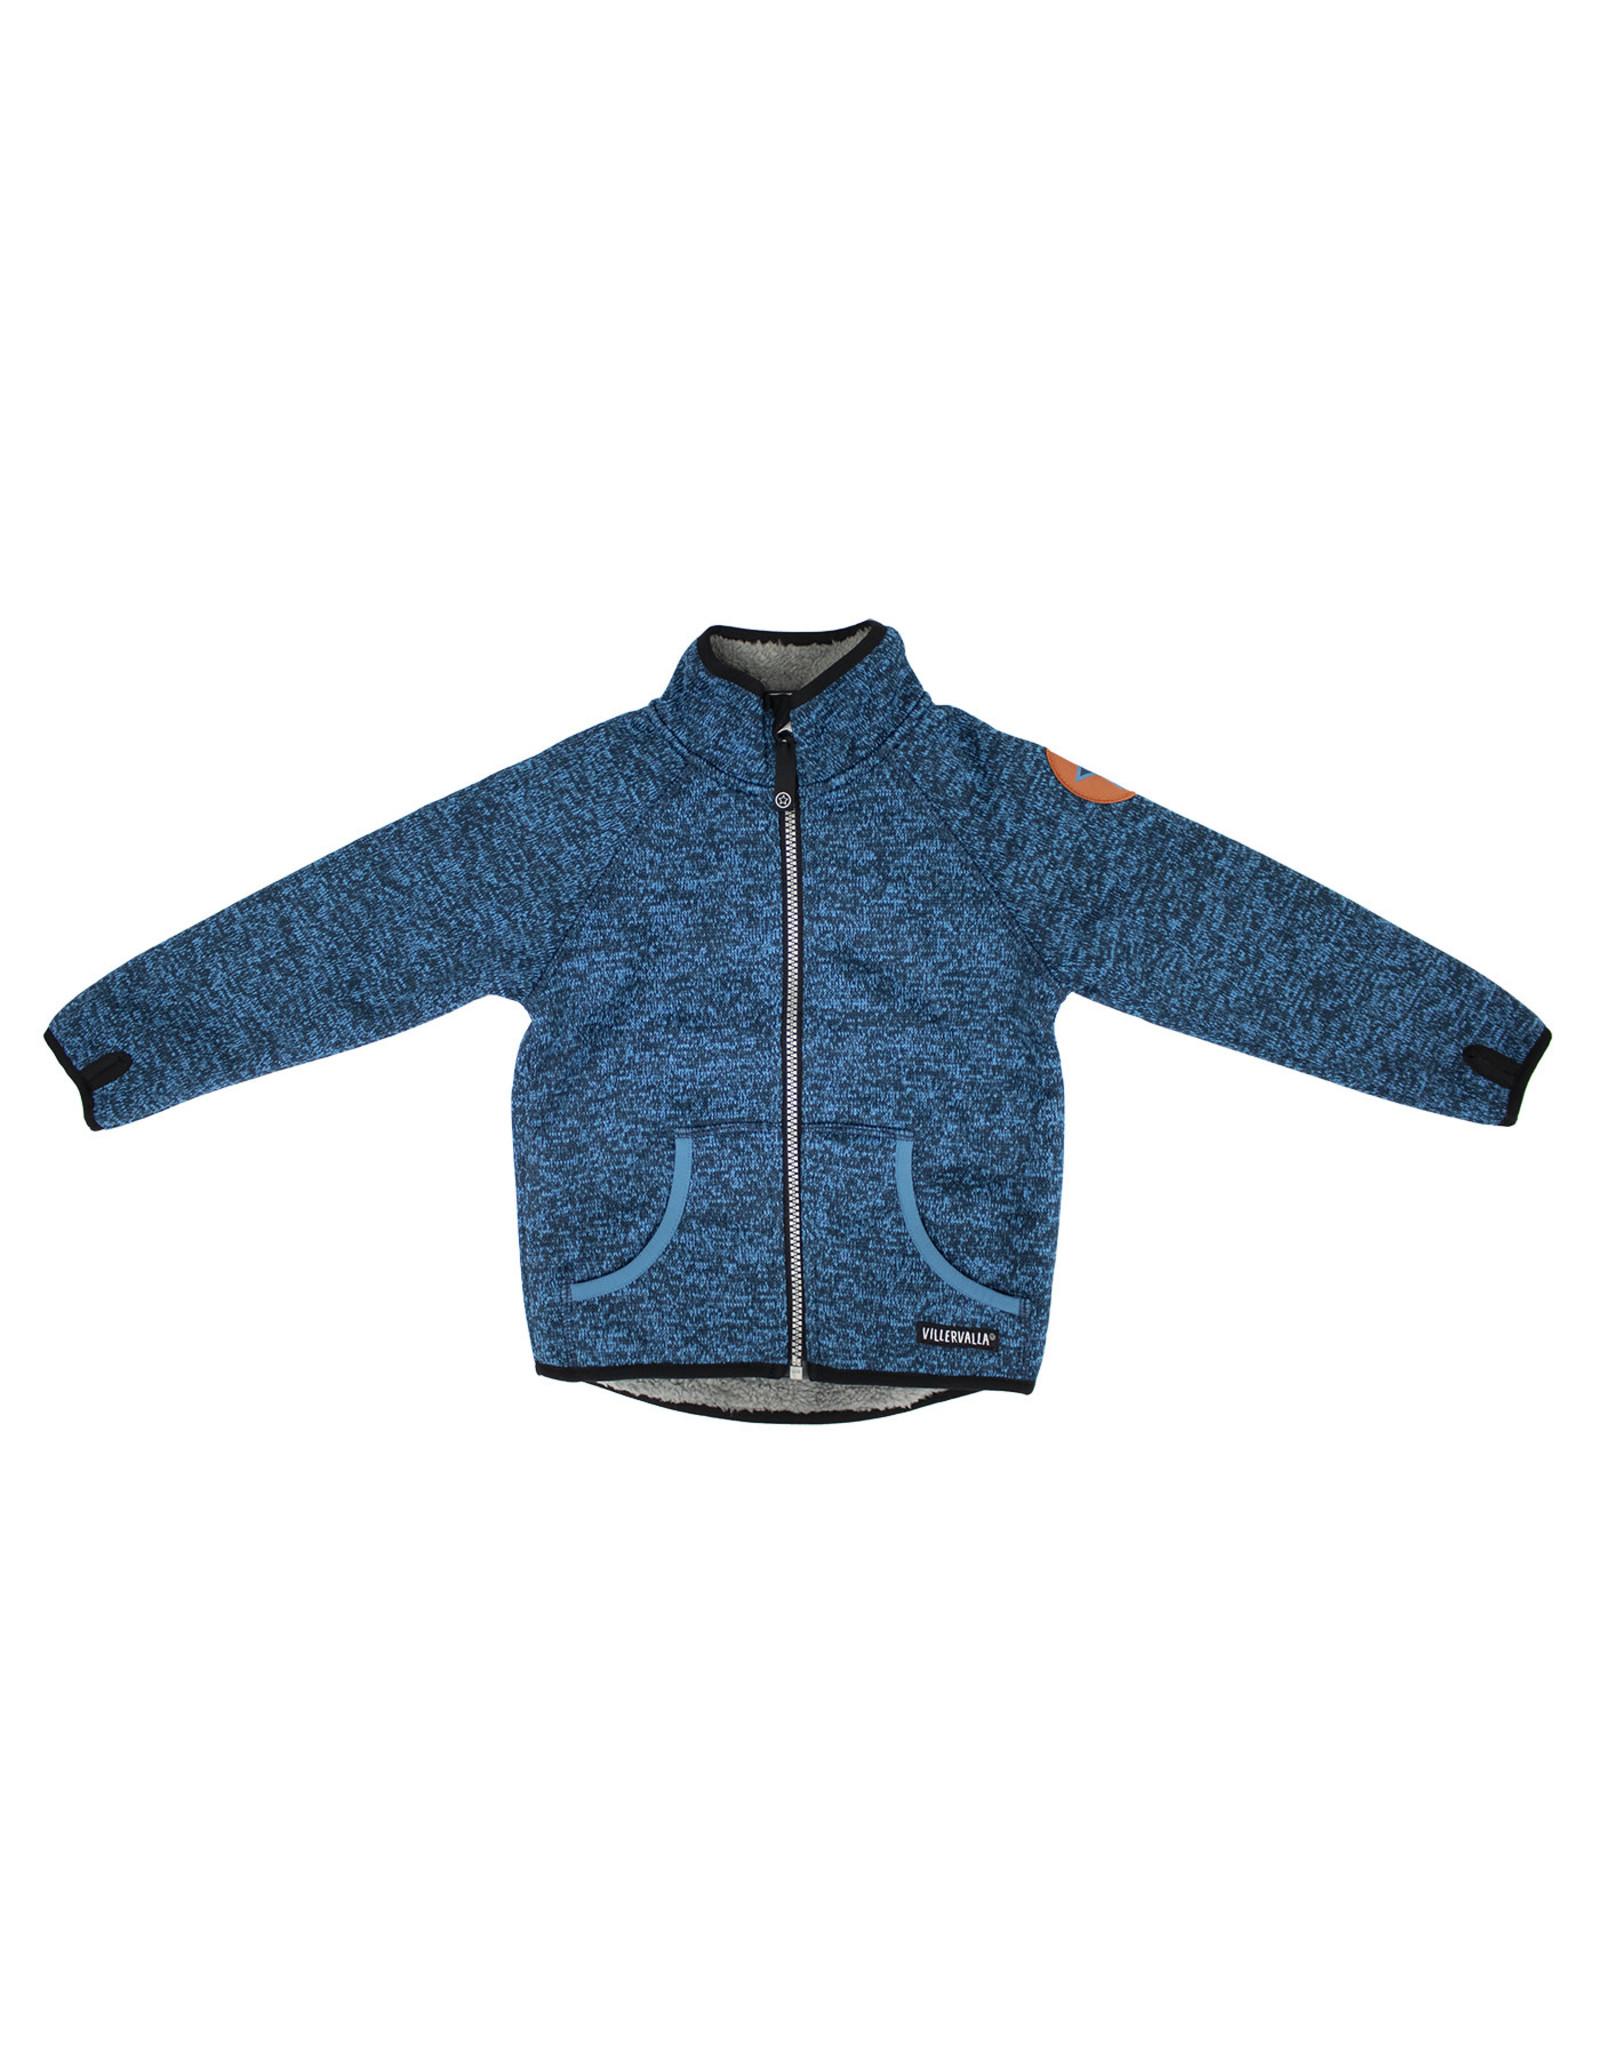 Villervalla Blauwe warme windstopper trui/jas met rits